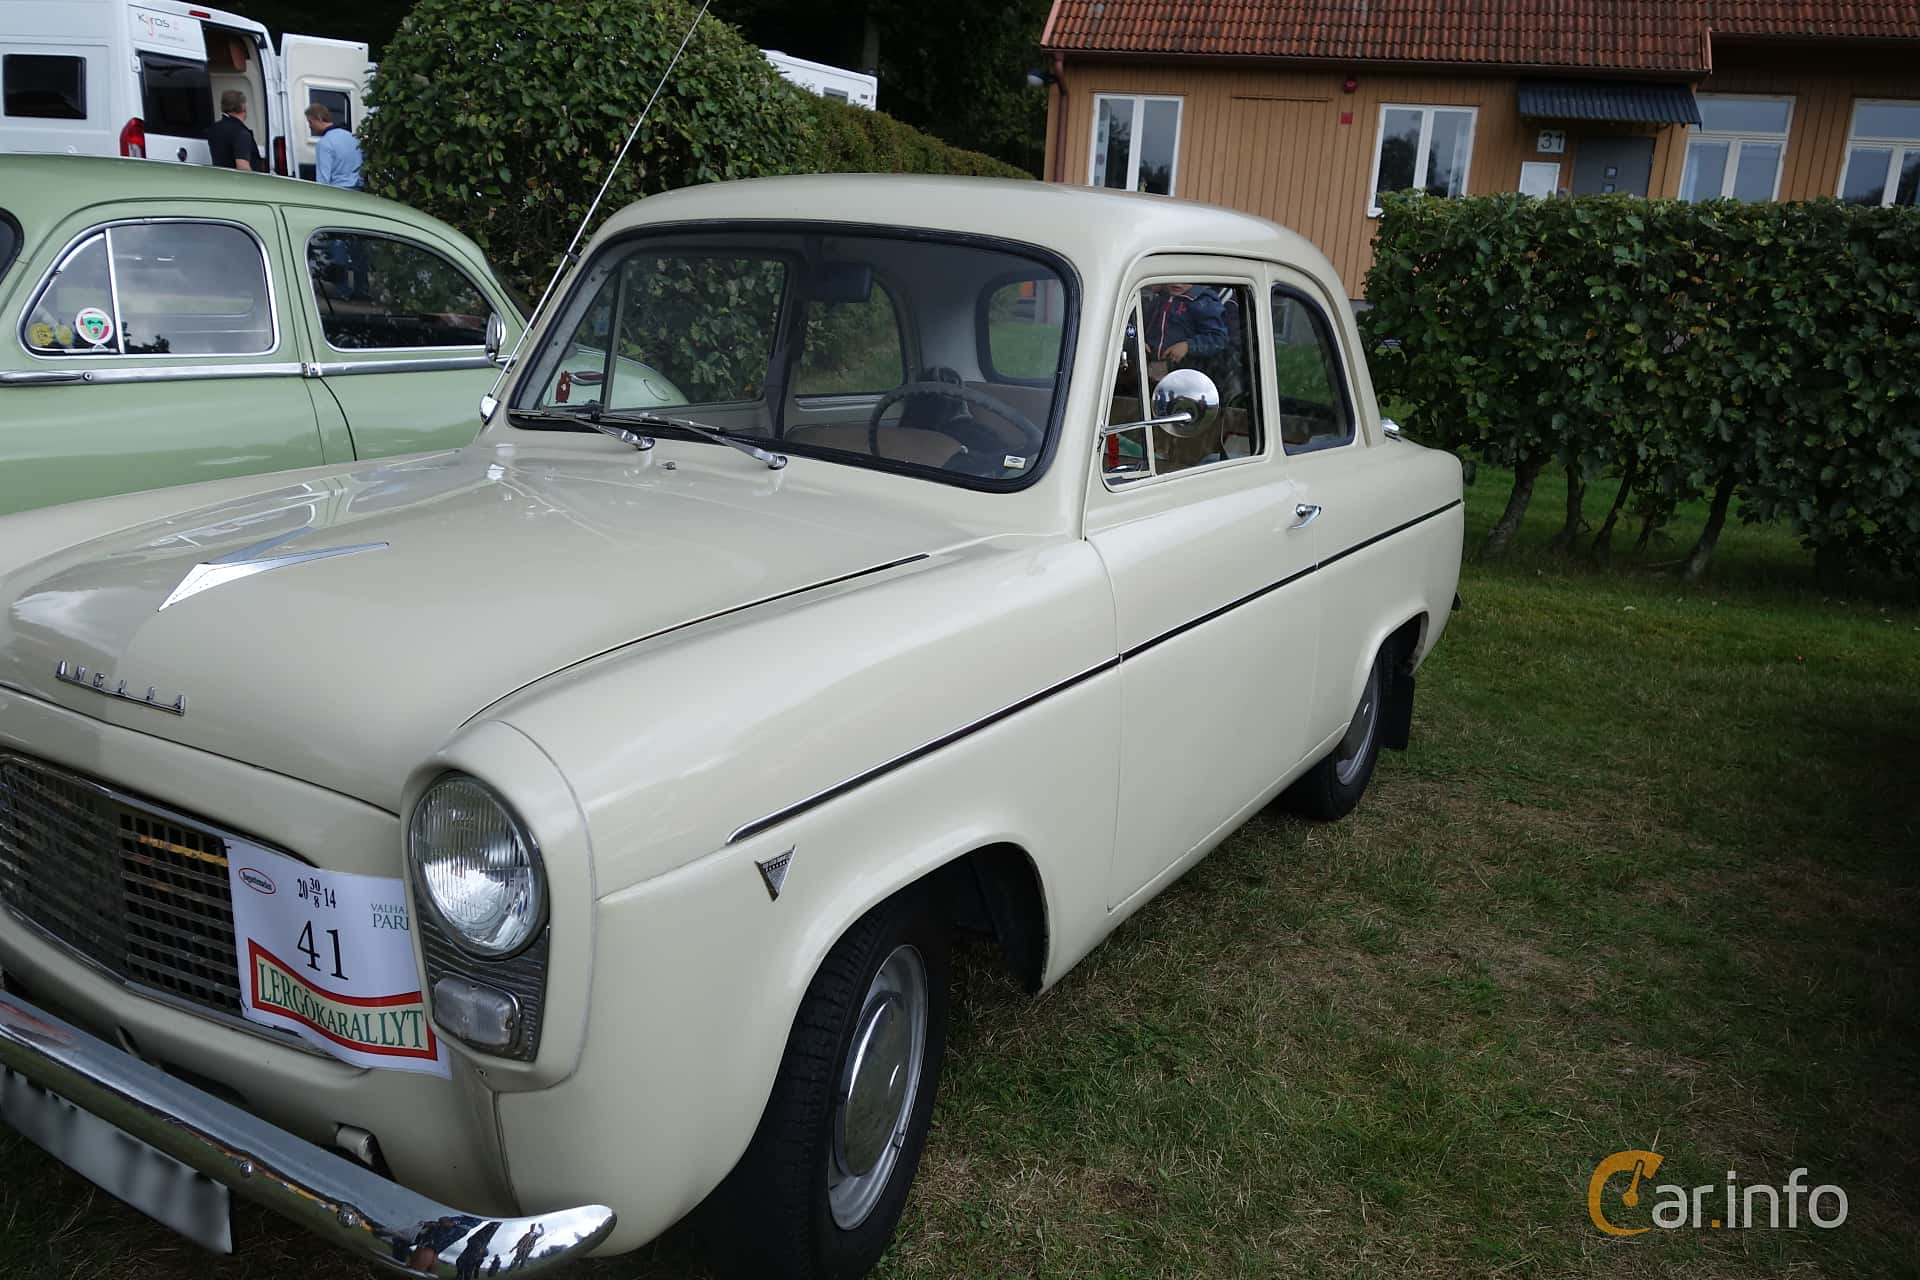 Ford Anglia 1.0 Manual, 38hp, 1959 at Lergökarallyt 2014